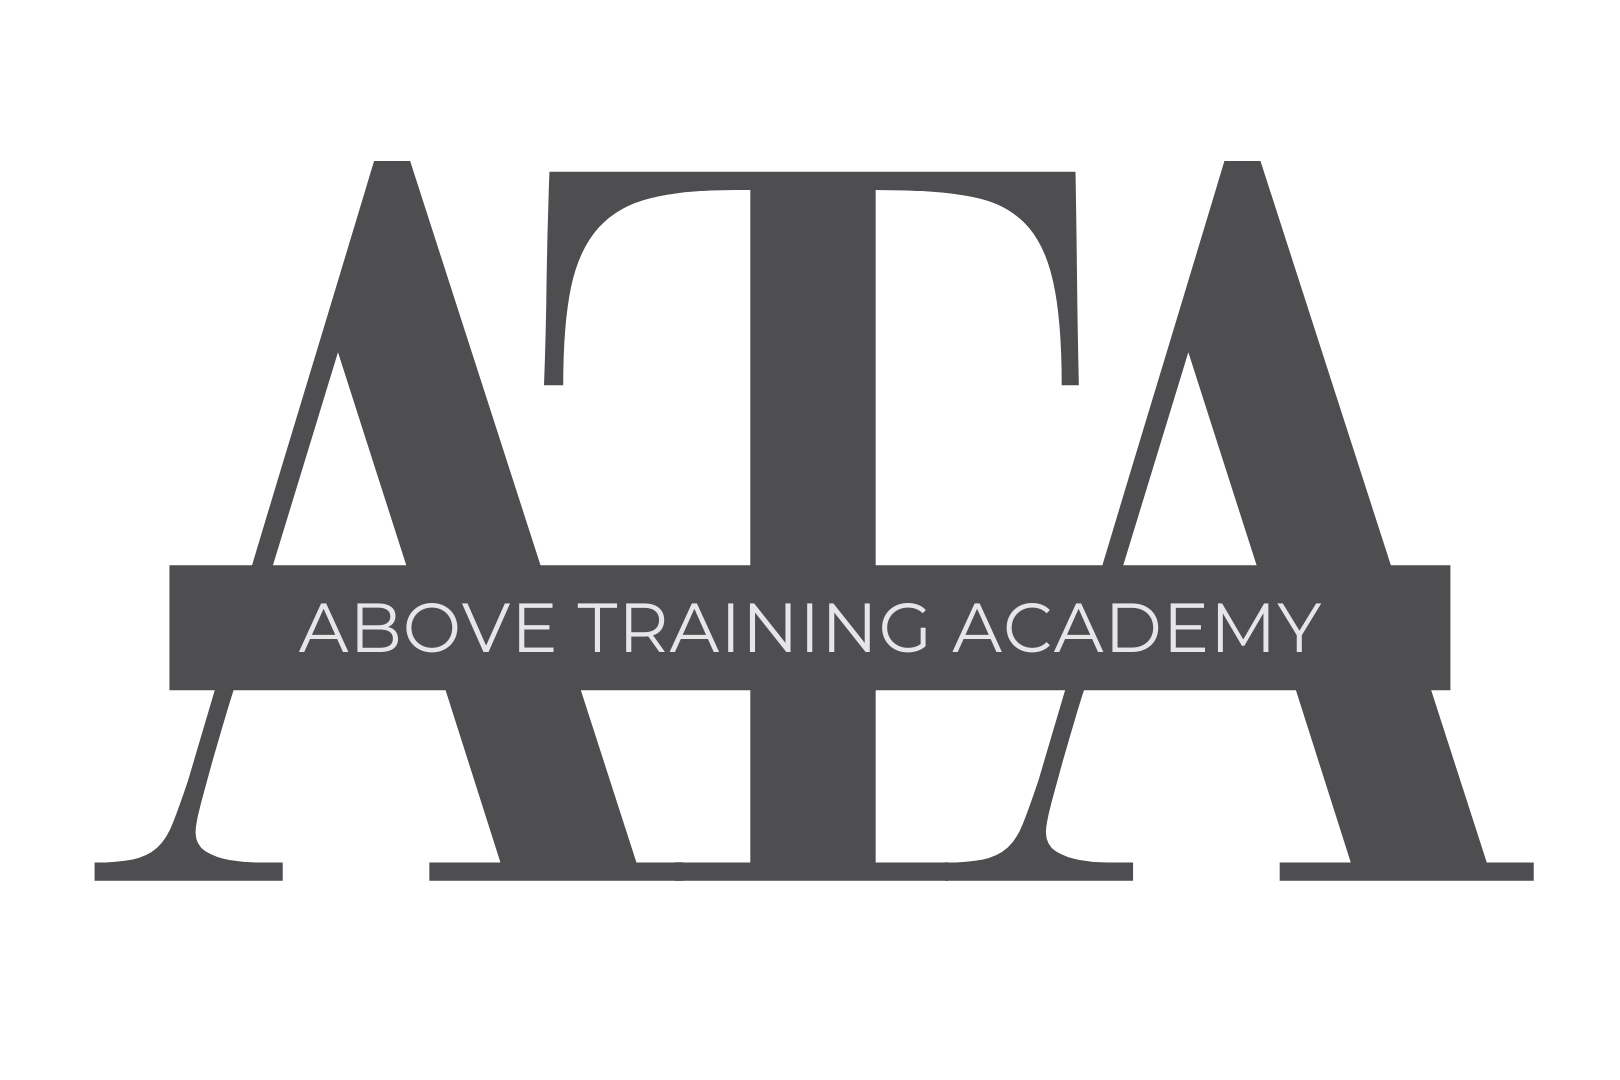 Above Training Academy